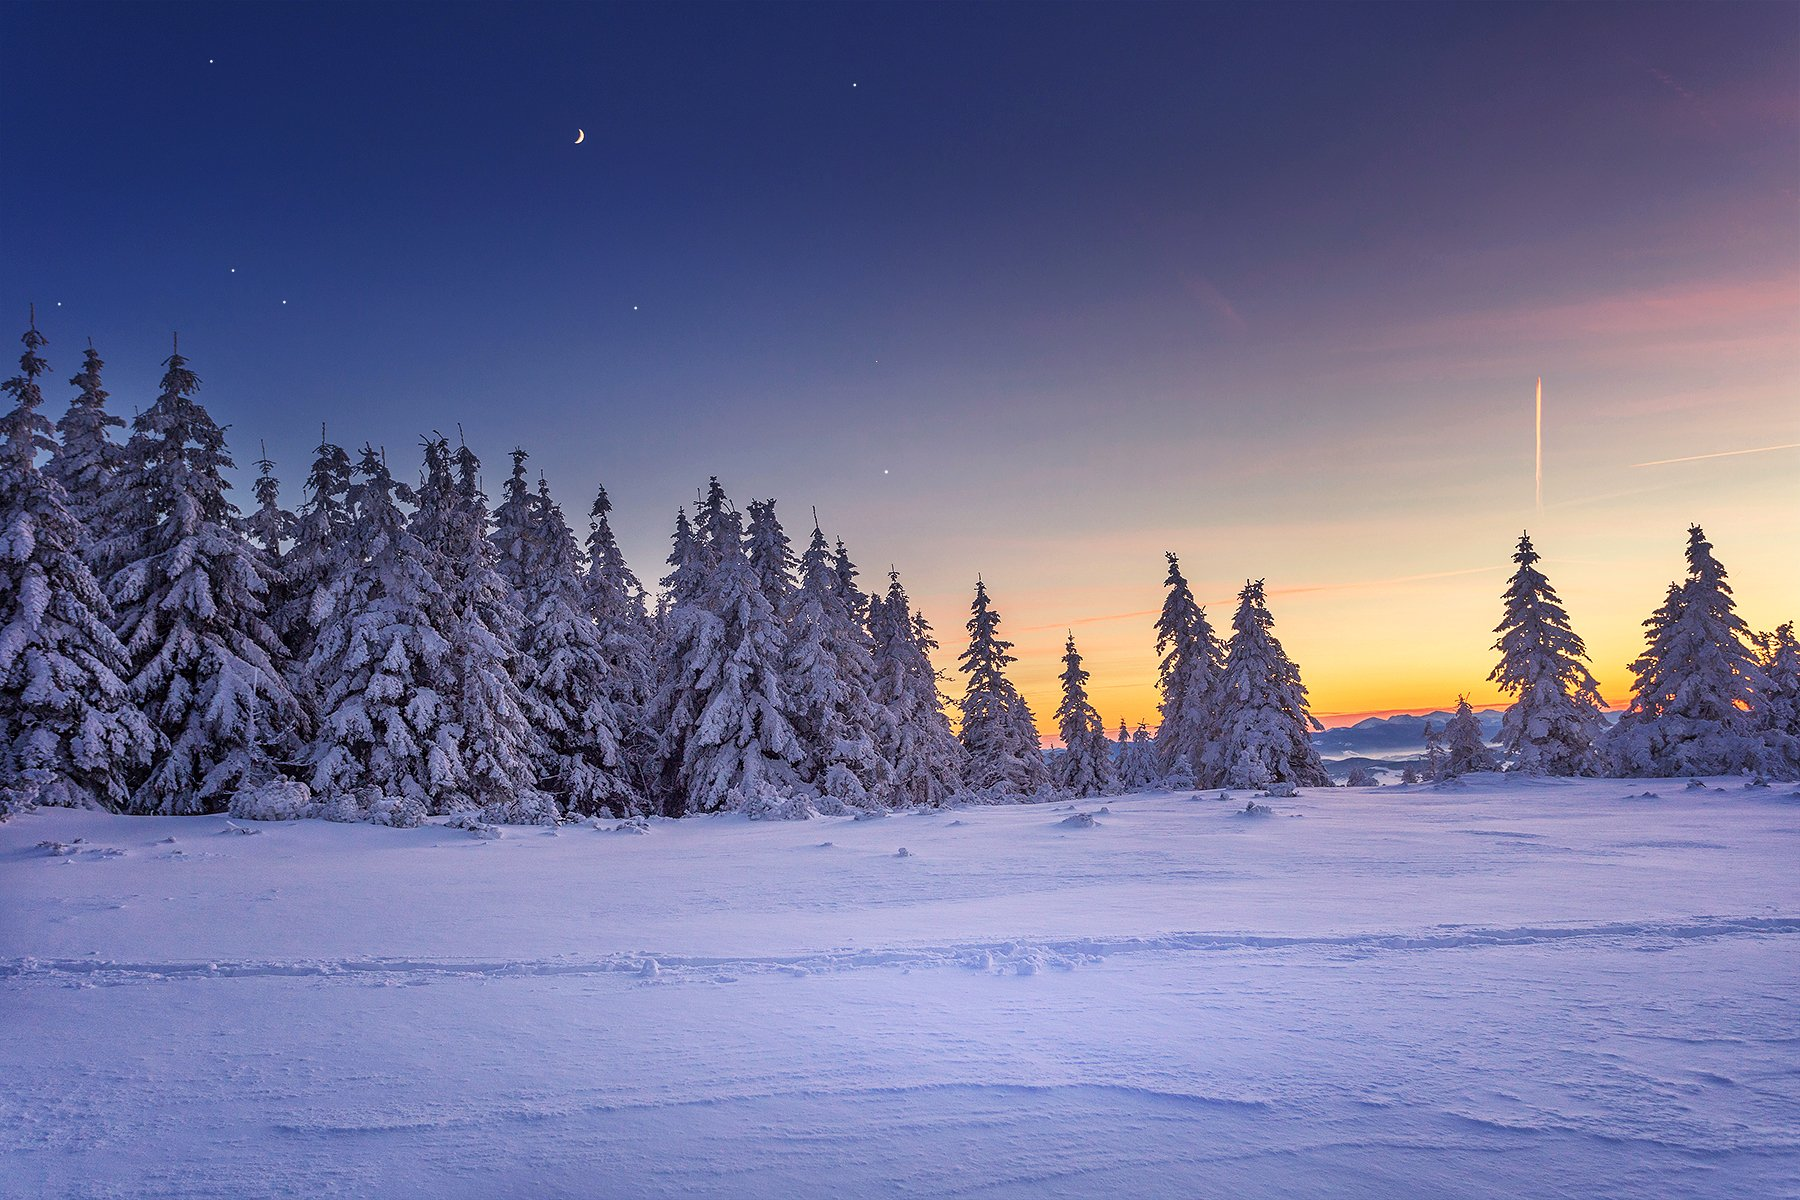 winter, night, sunset, stars, trees, Beskids, Poland, snow, Patrycja